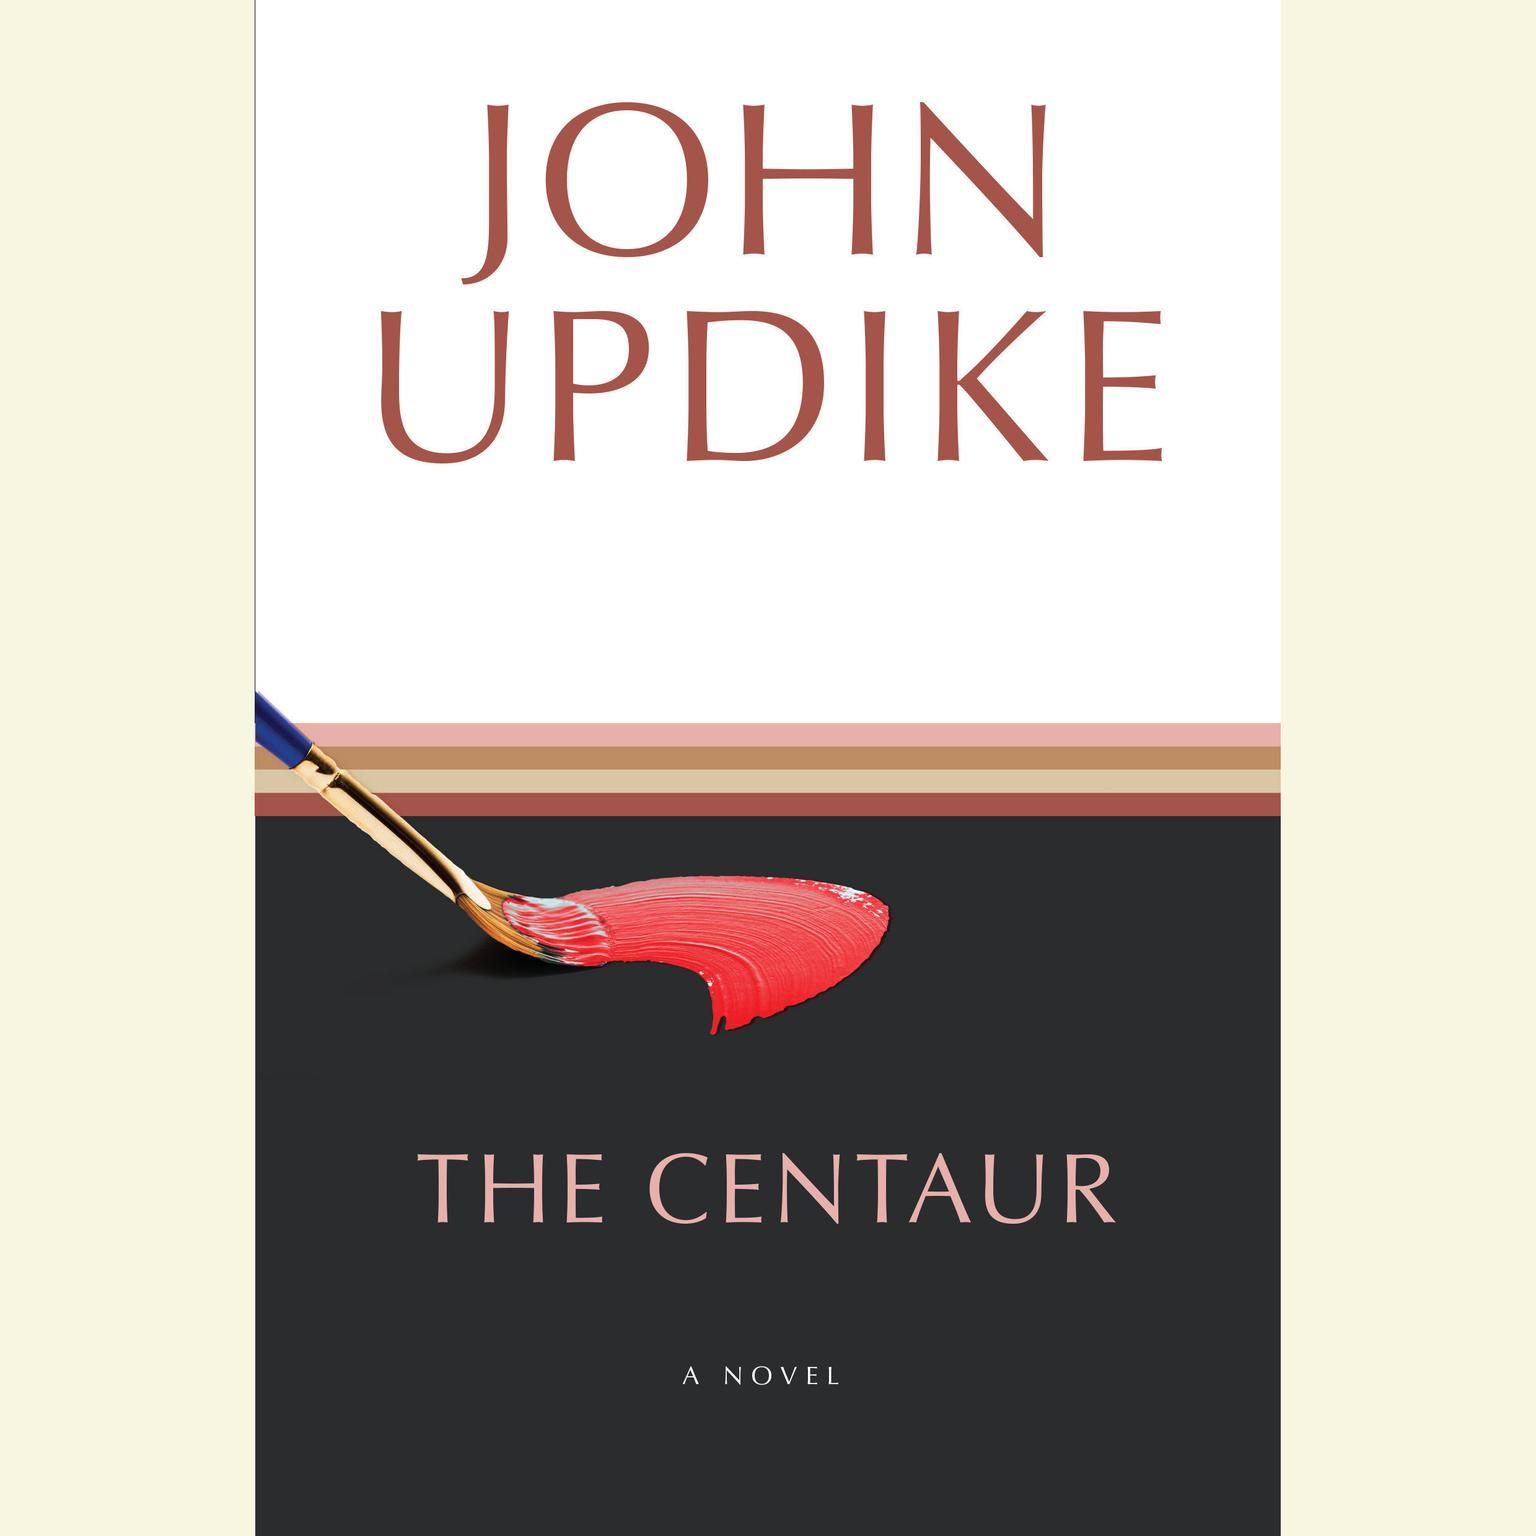 The Centaur Audiobook, by John Updike